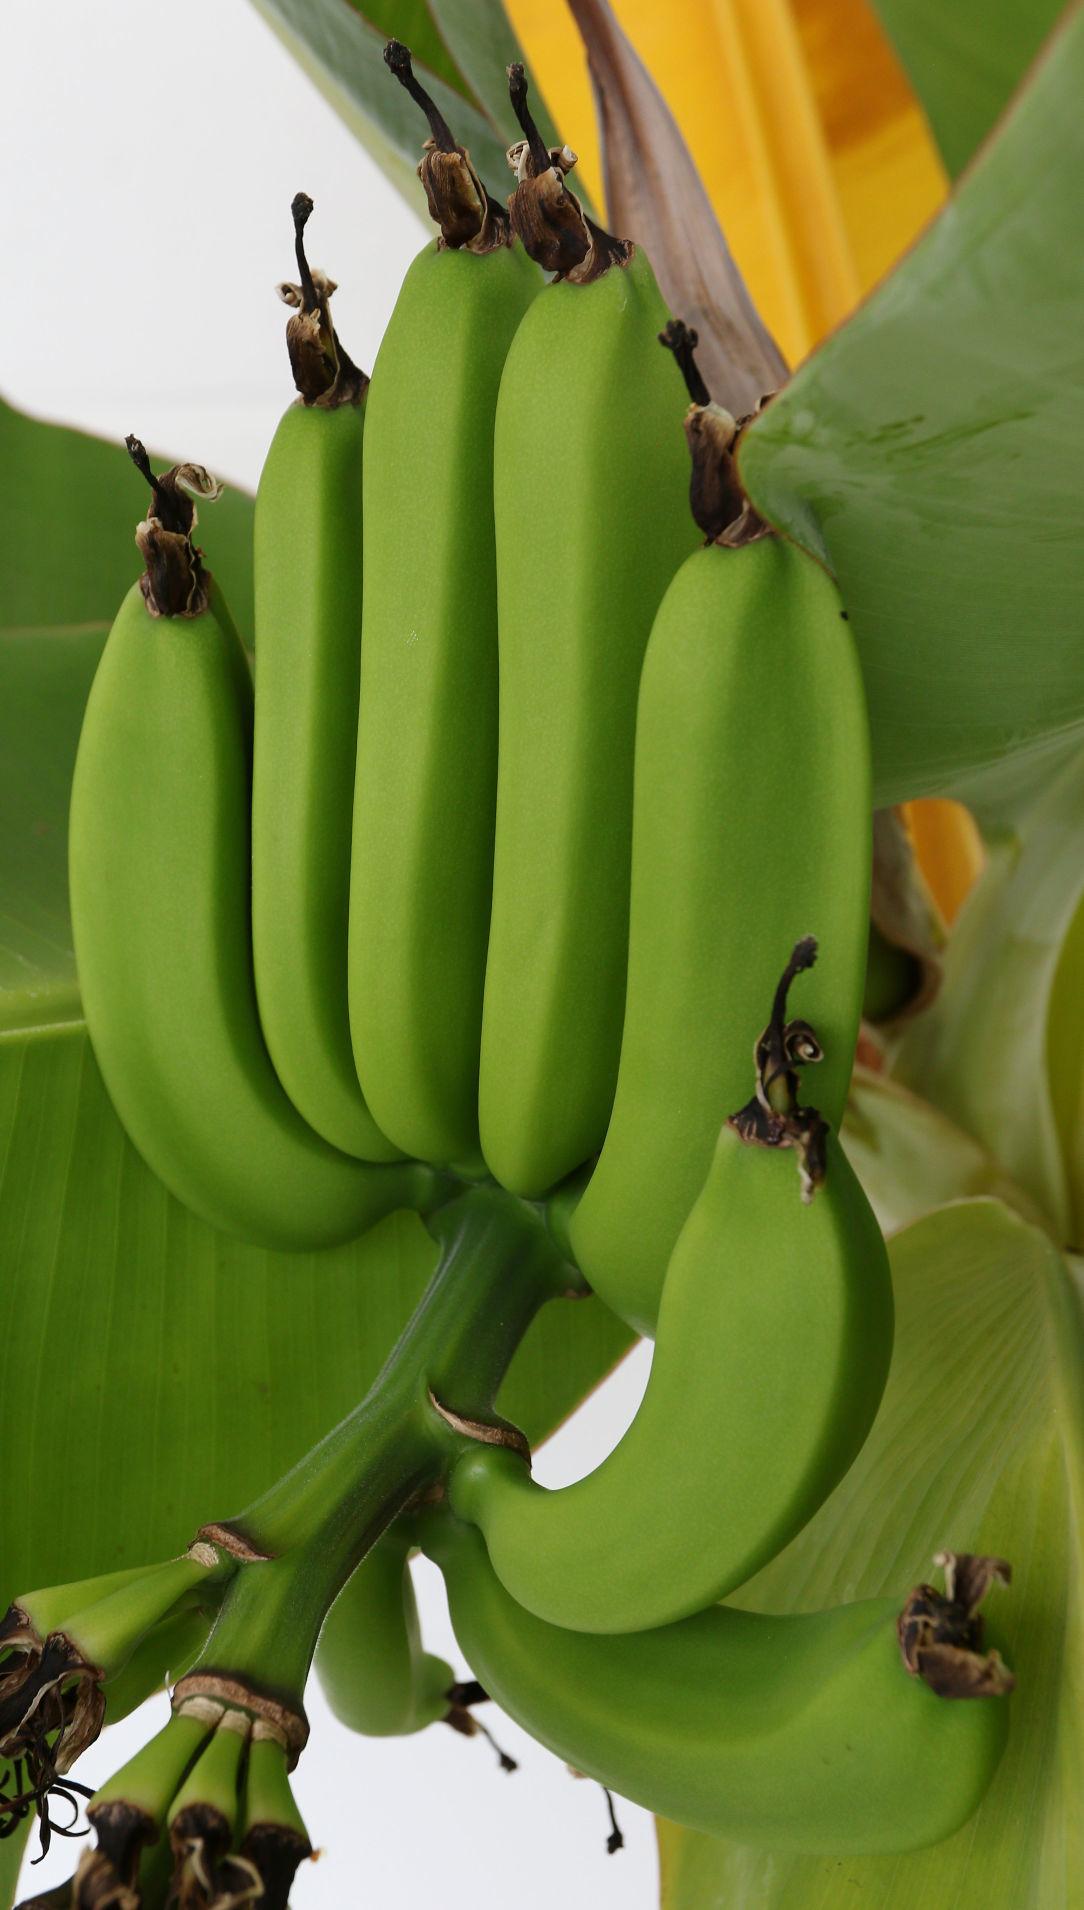 082719_dr_banana_5a